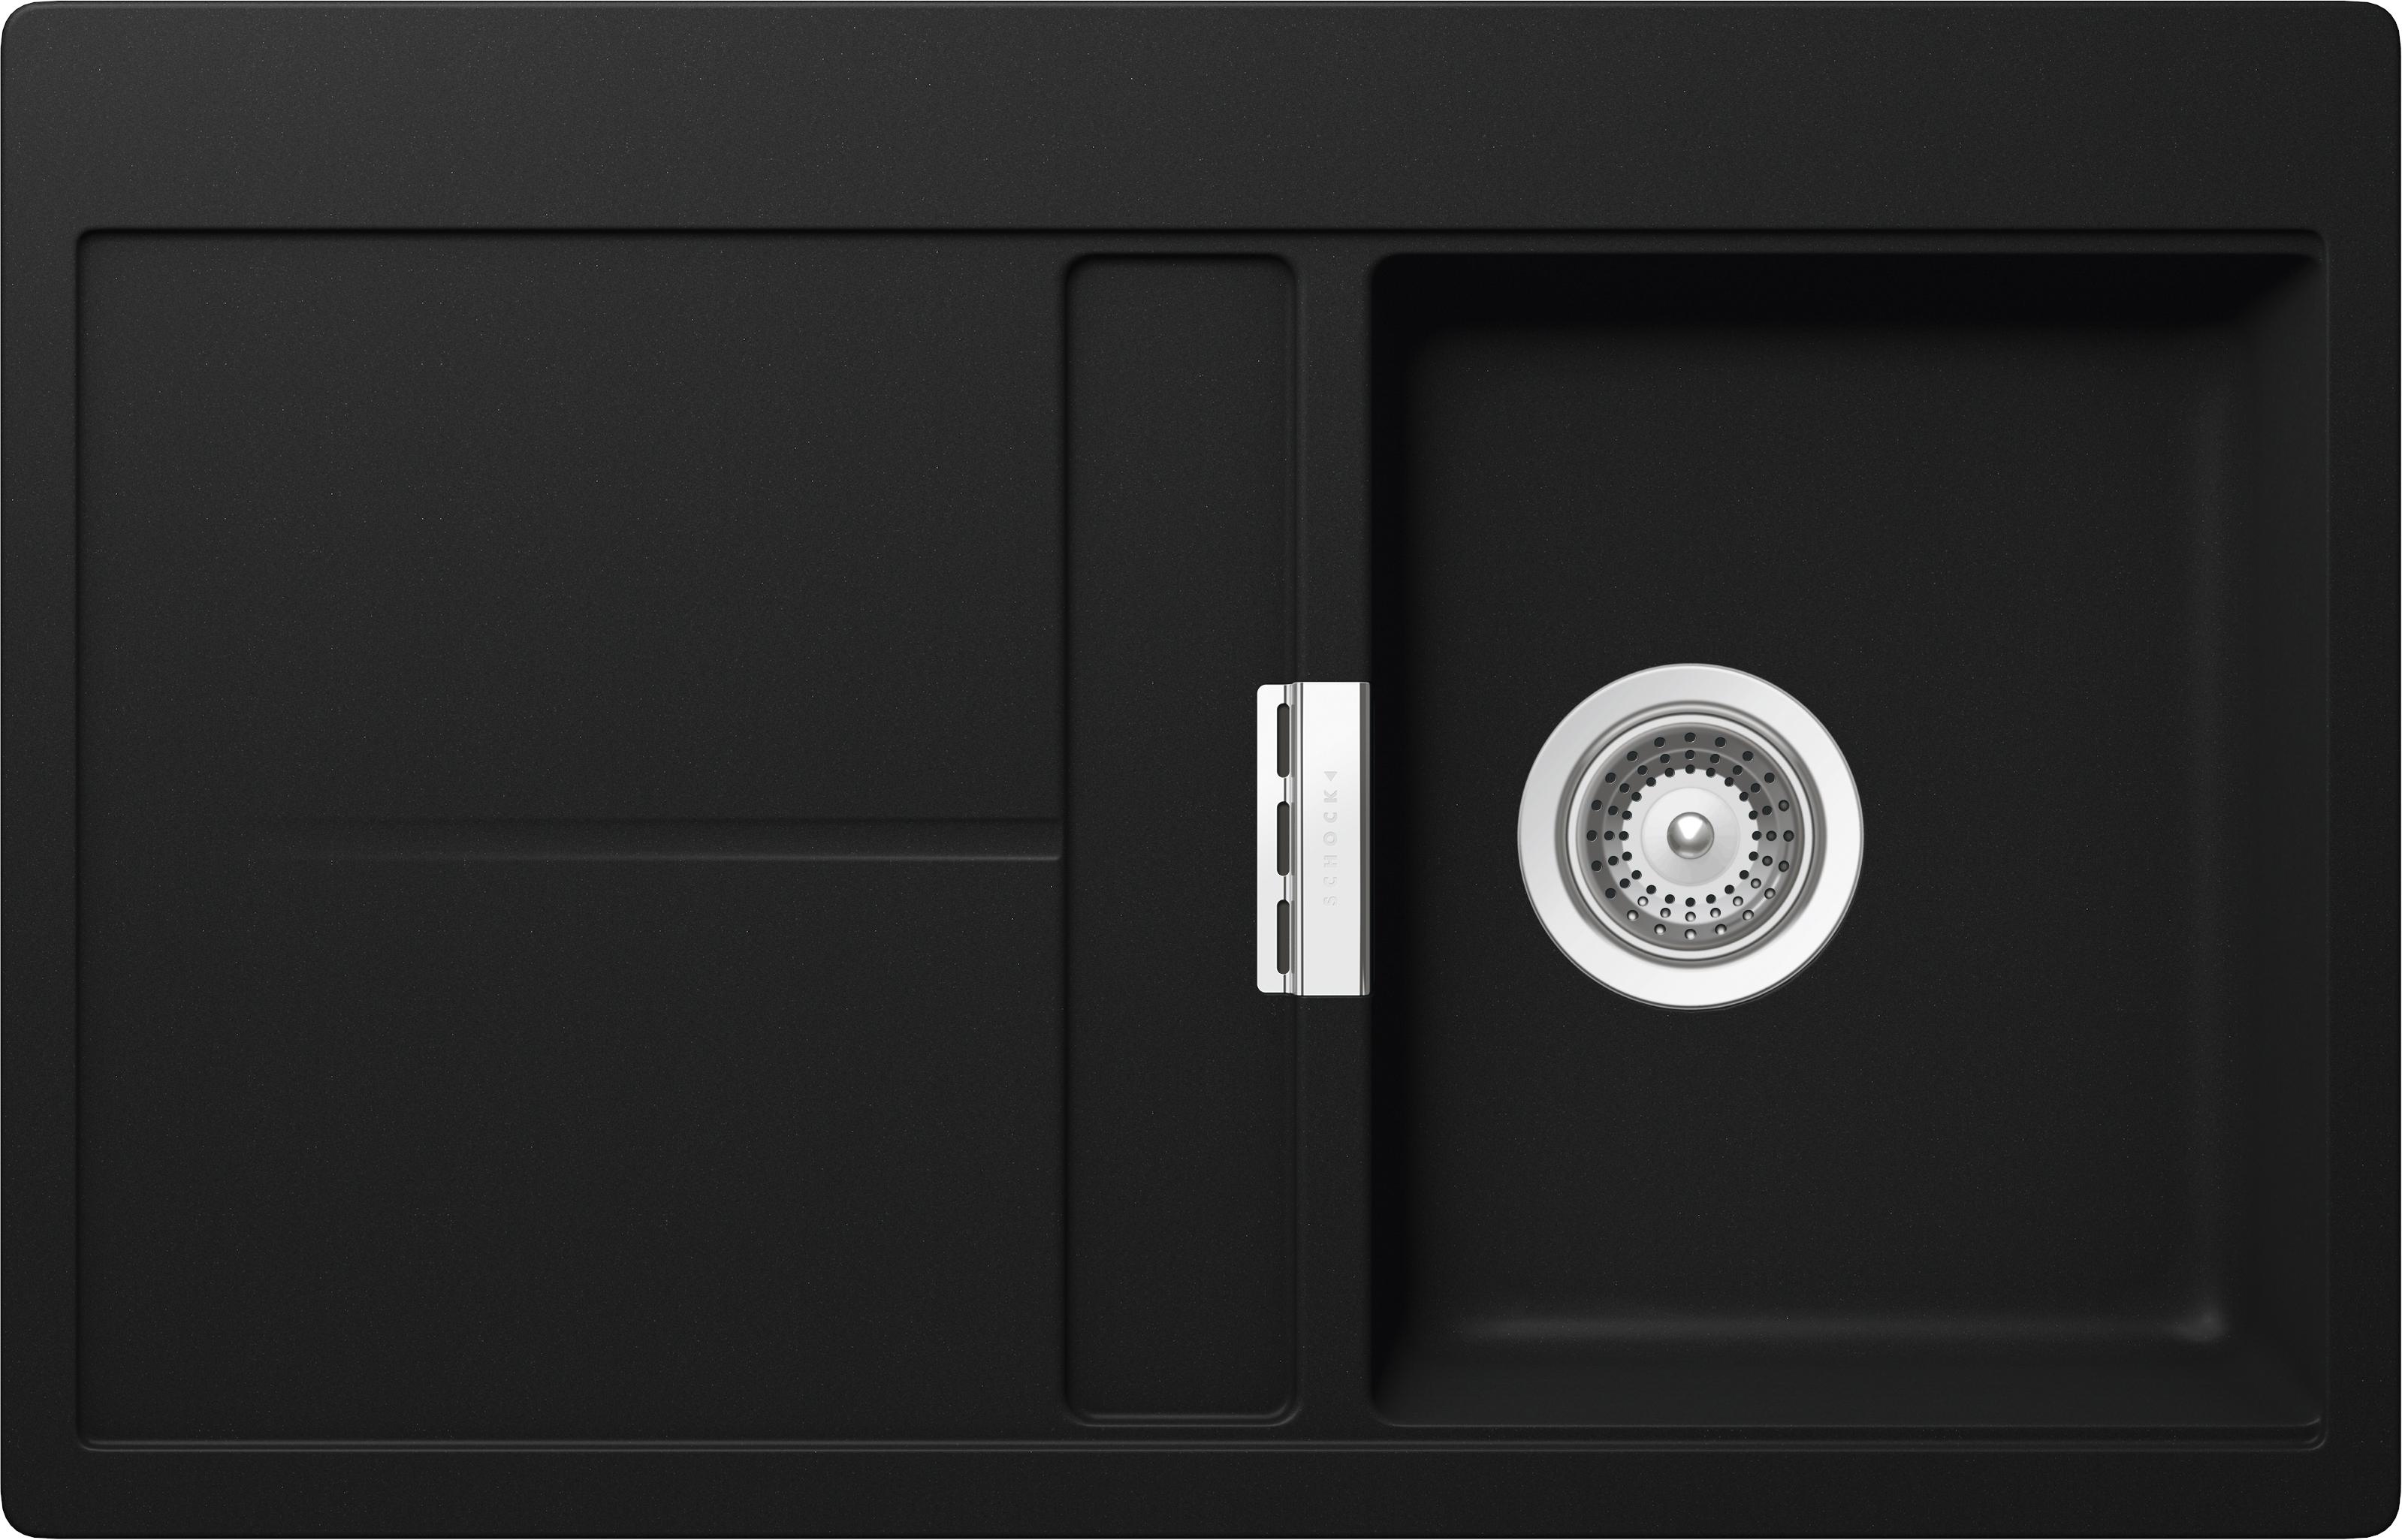 d ezy schock cristadur jednod ezy s odkapem schock horizont d 100 puro granitov d ezy a. Black Bedroom Furniture Sets. Home Design Ideas